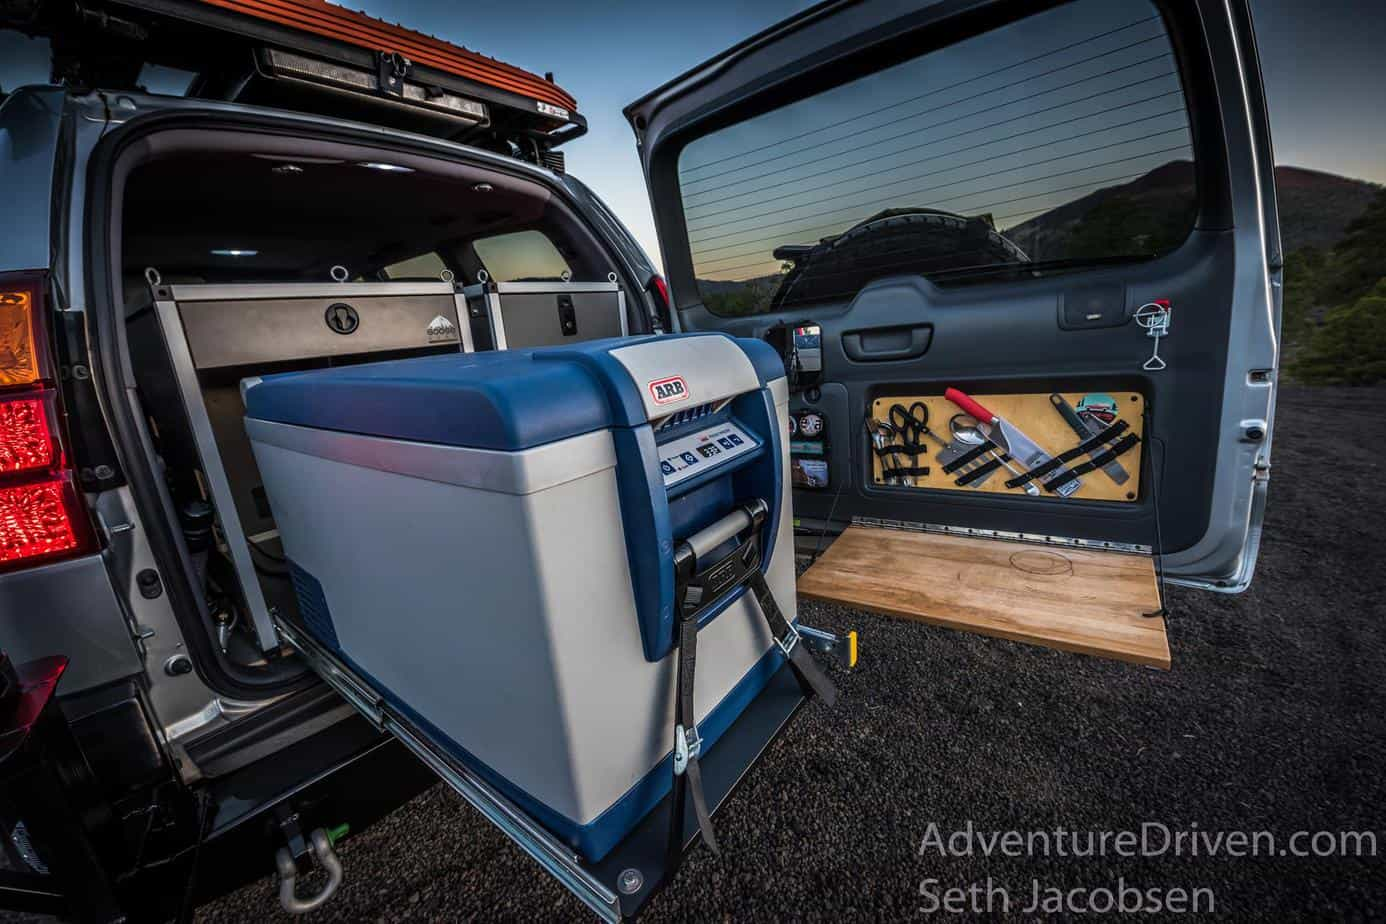 Adventure Driven Lexy ARB fridge-1 (Copy)